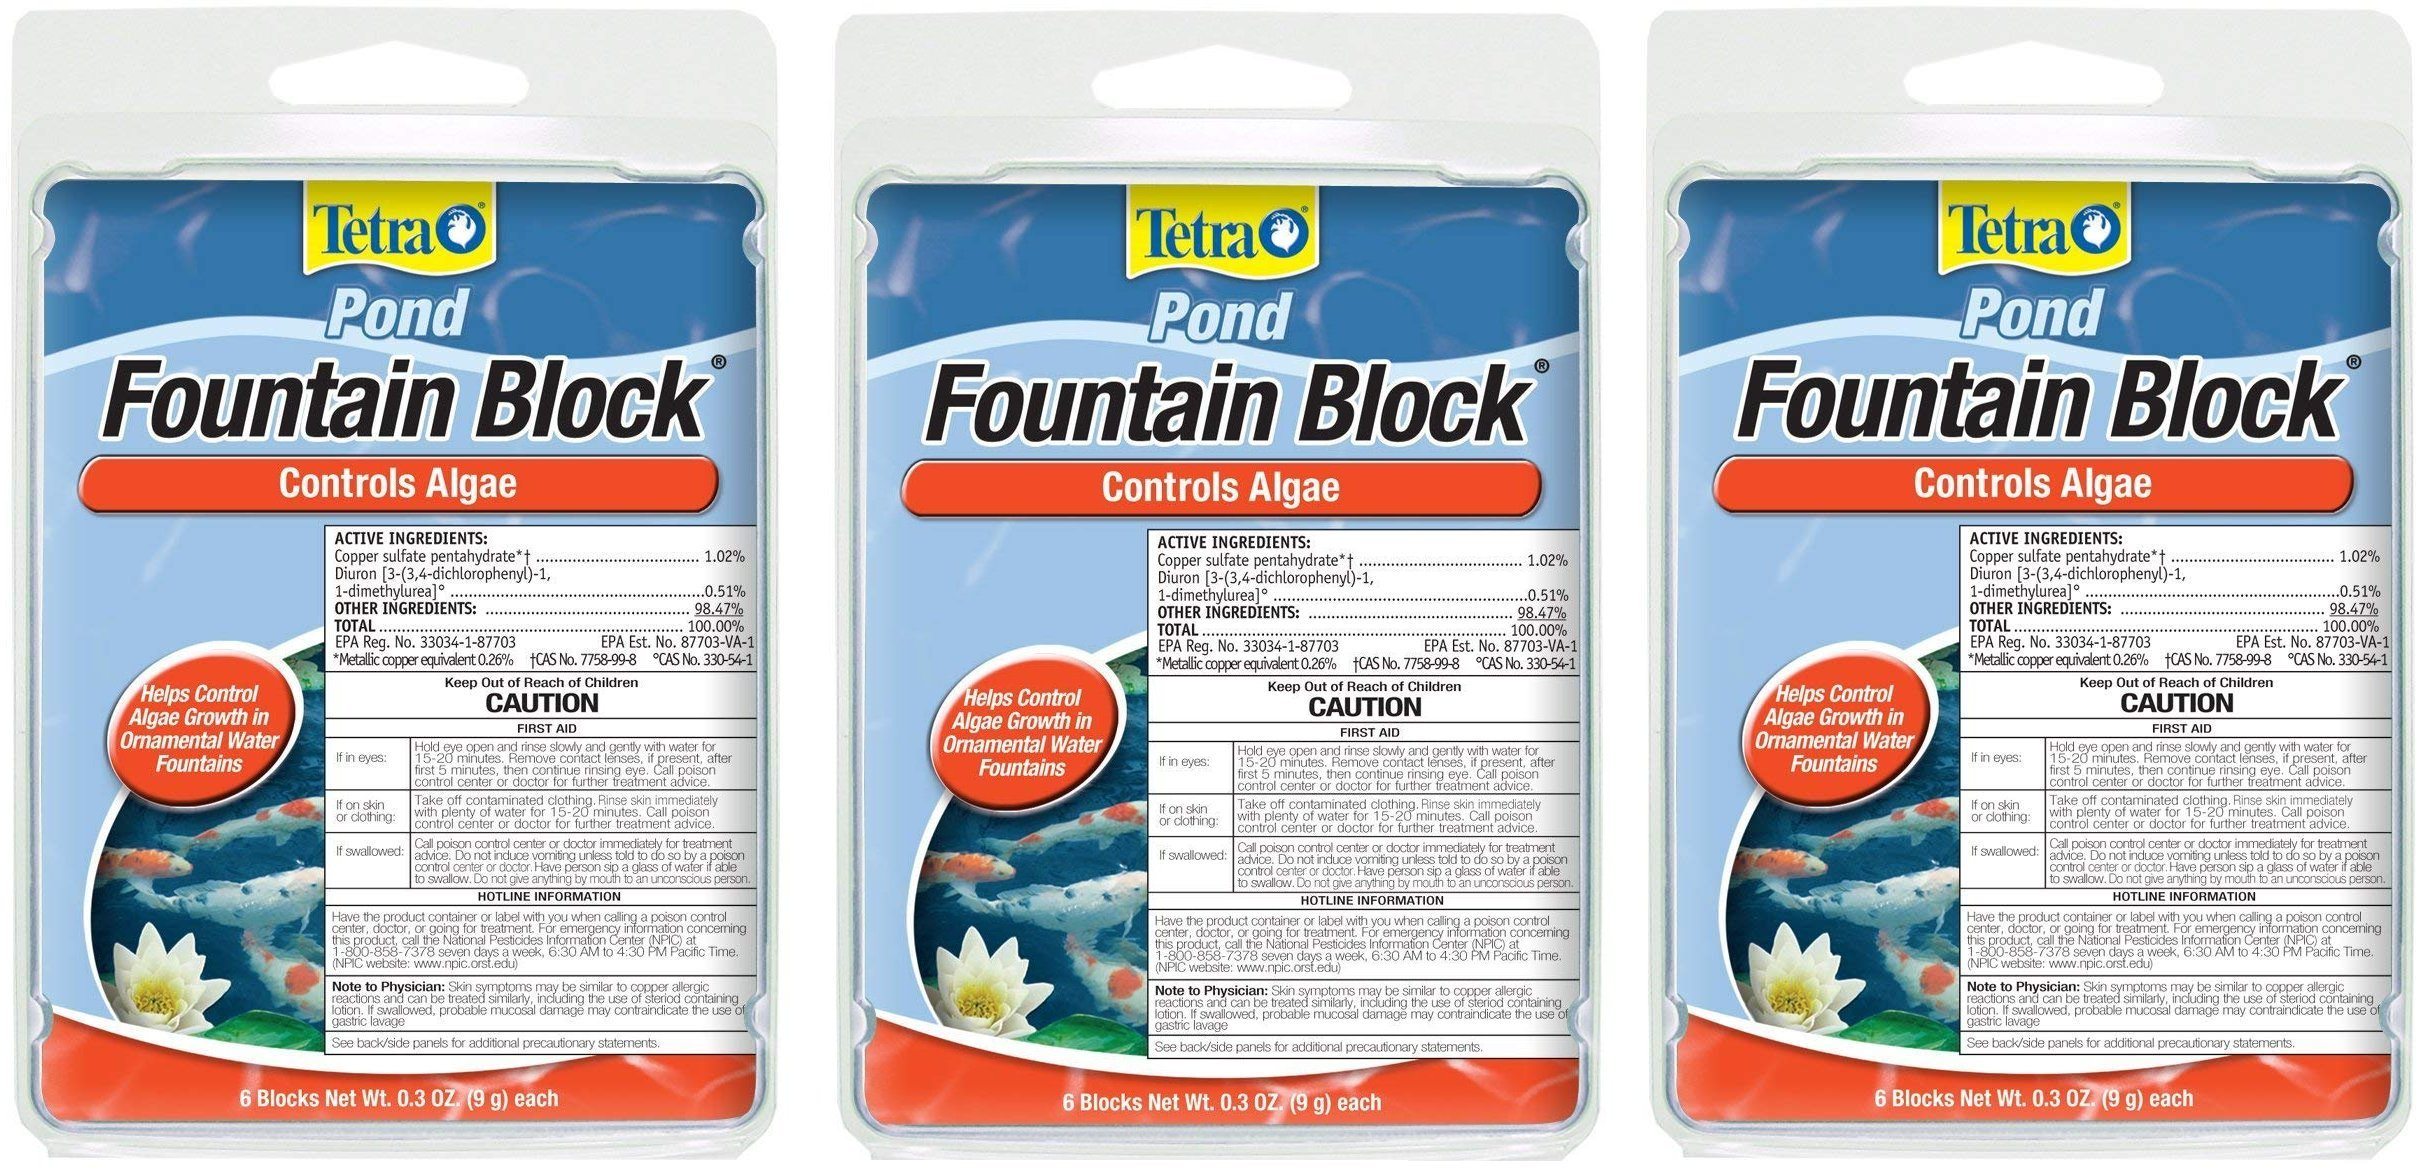 Tetra Pond Anti-Algae Control Blocks for Fountains, 6-Count (3-Pack)